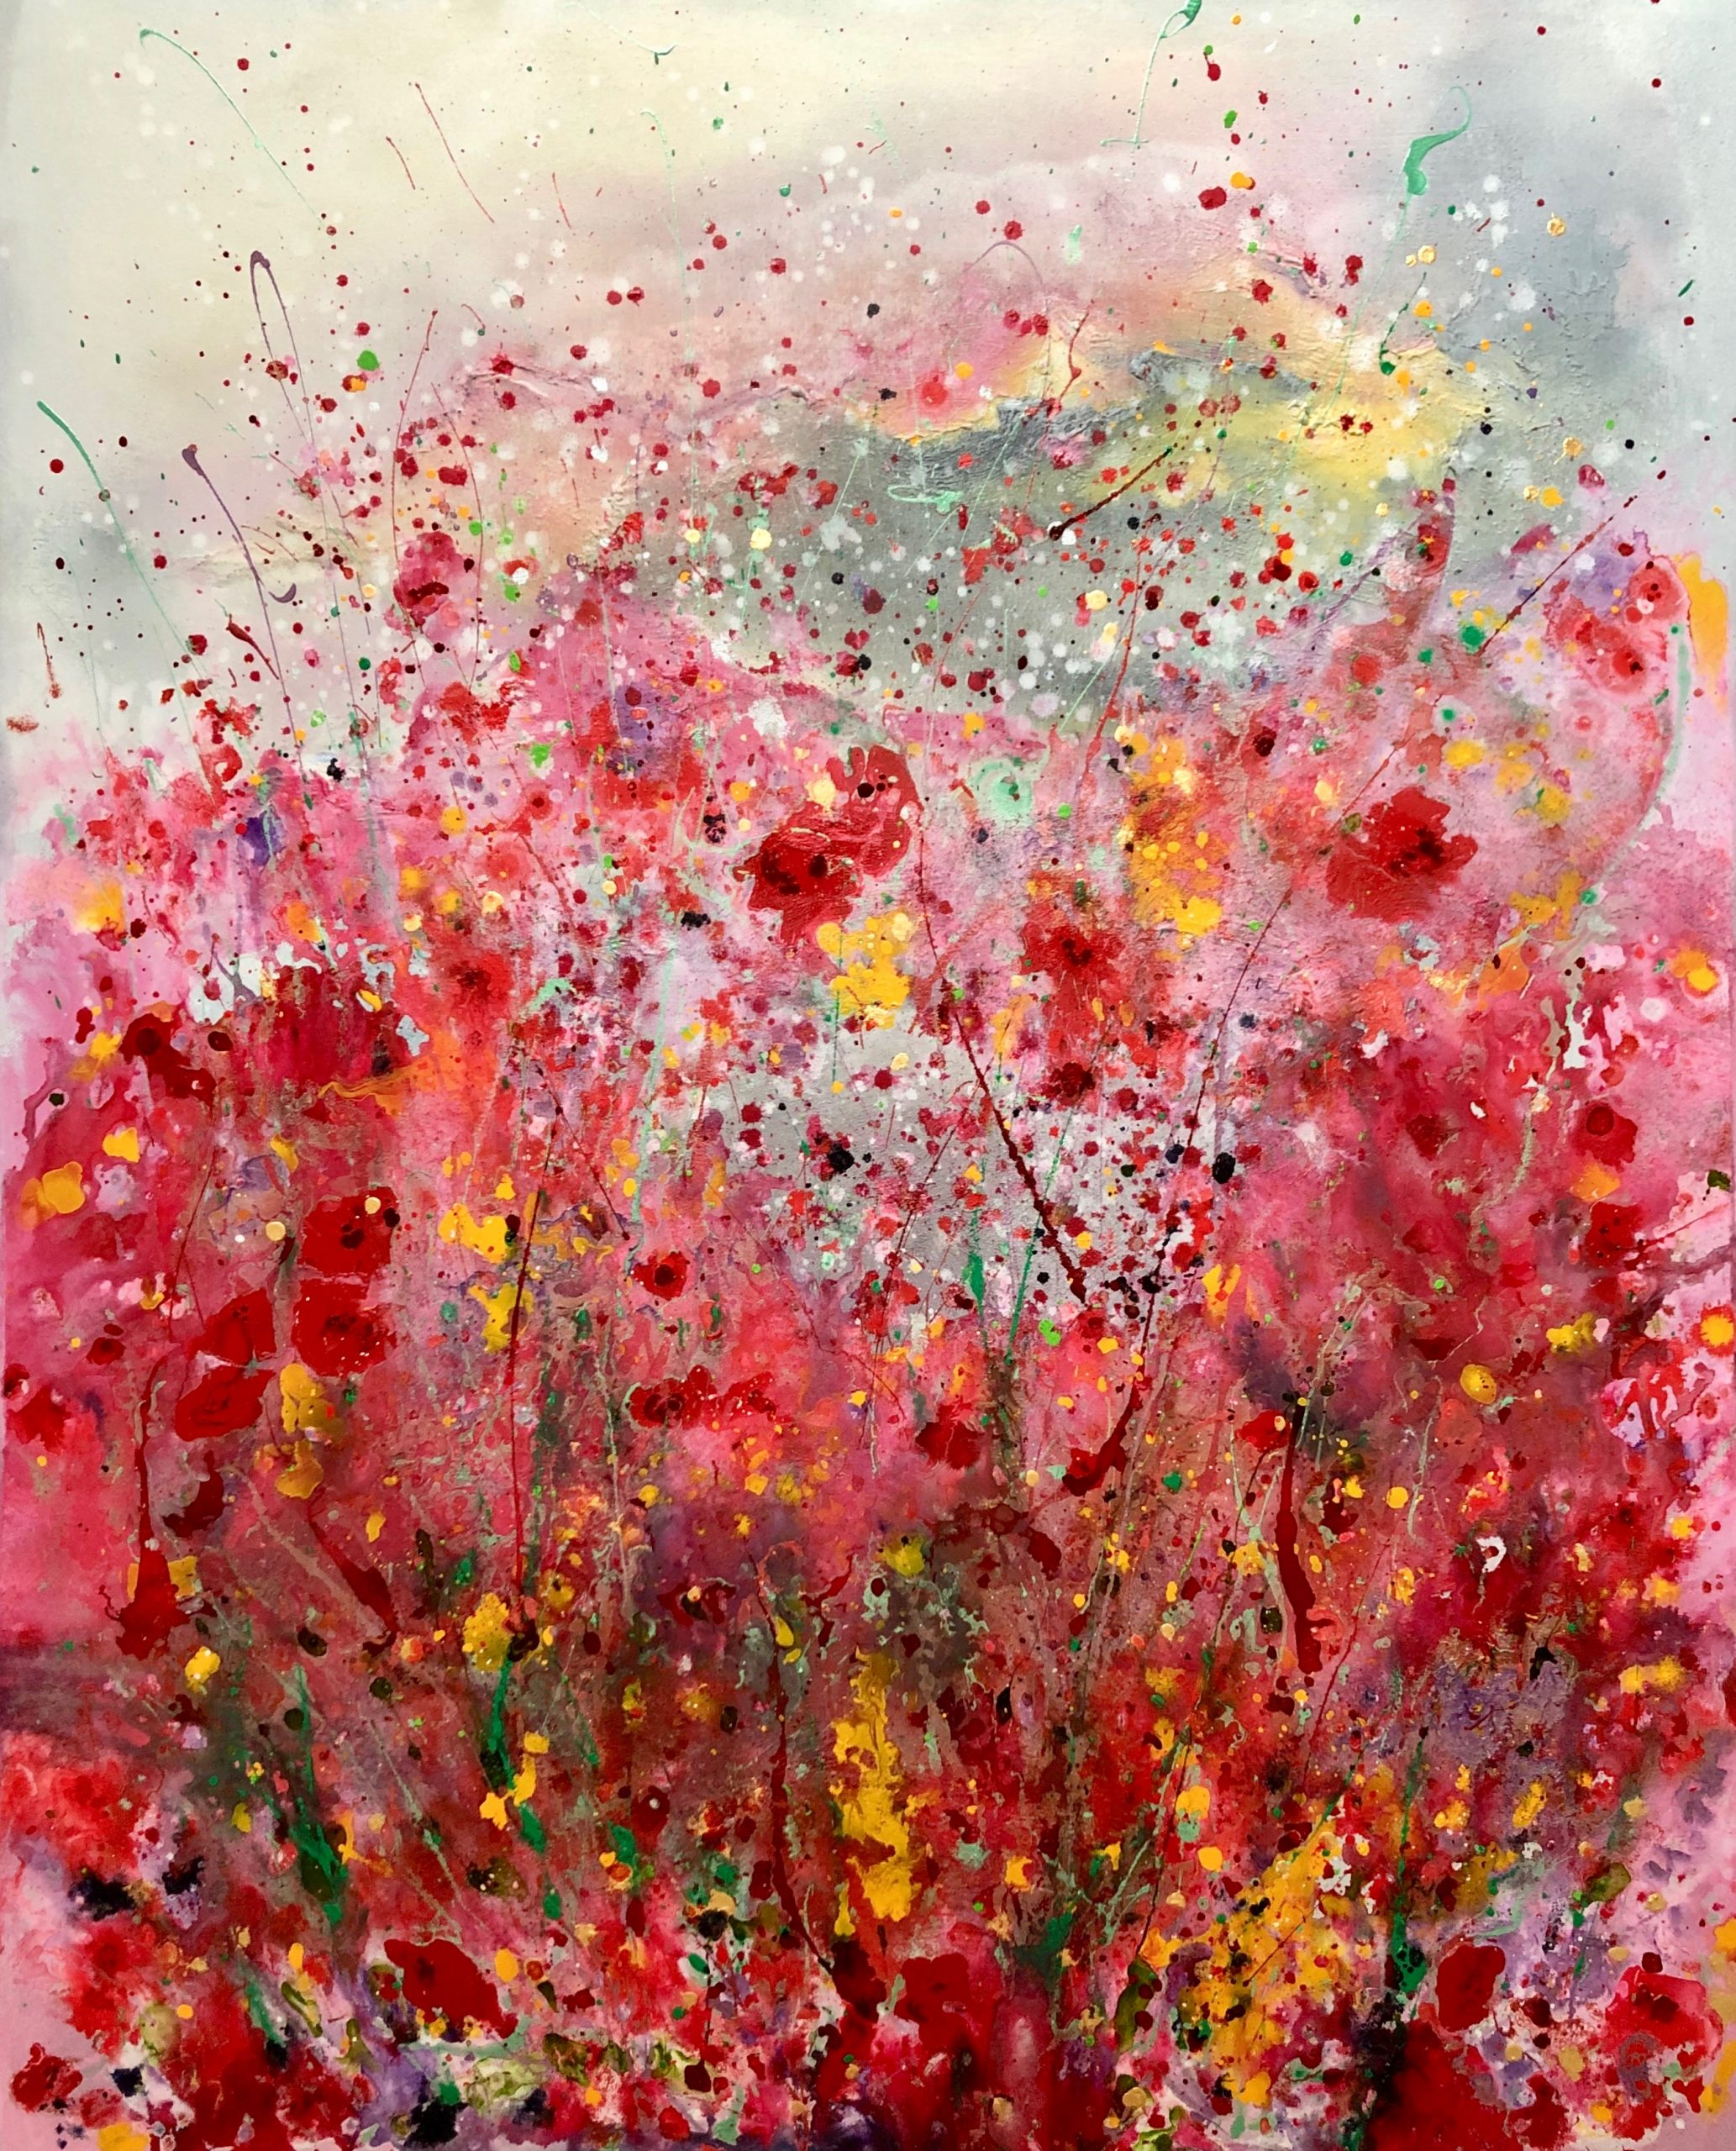 41.Primavera 100x126. Acrylic_mixed media on block canvas framed £1650